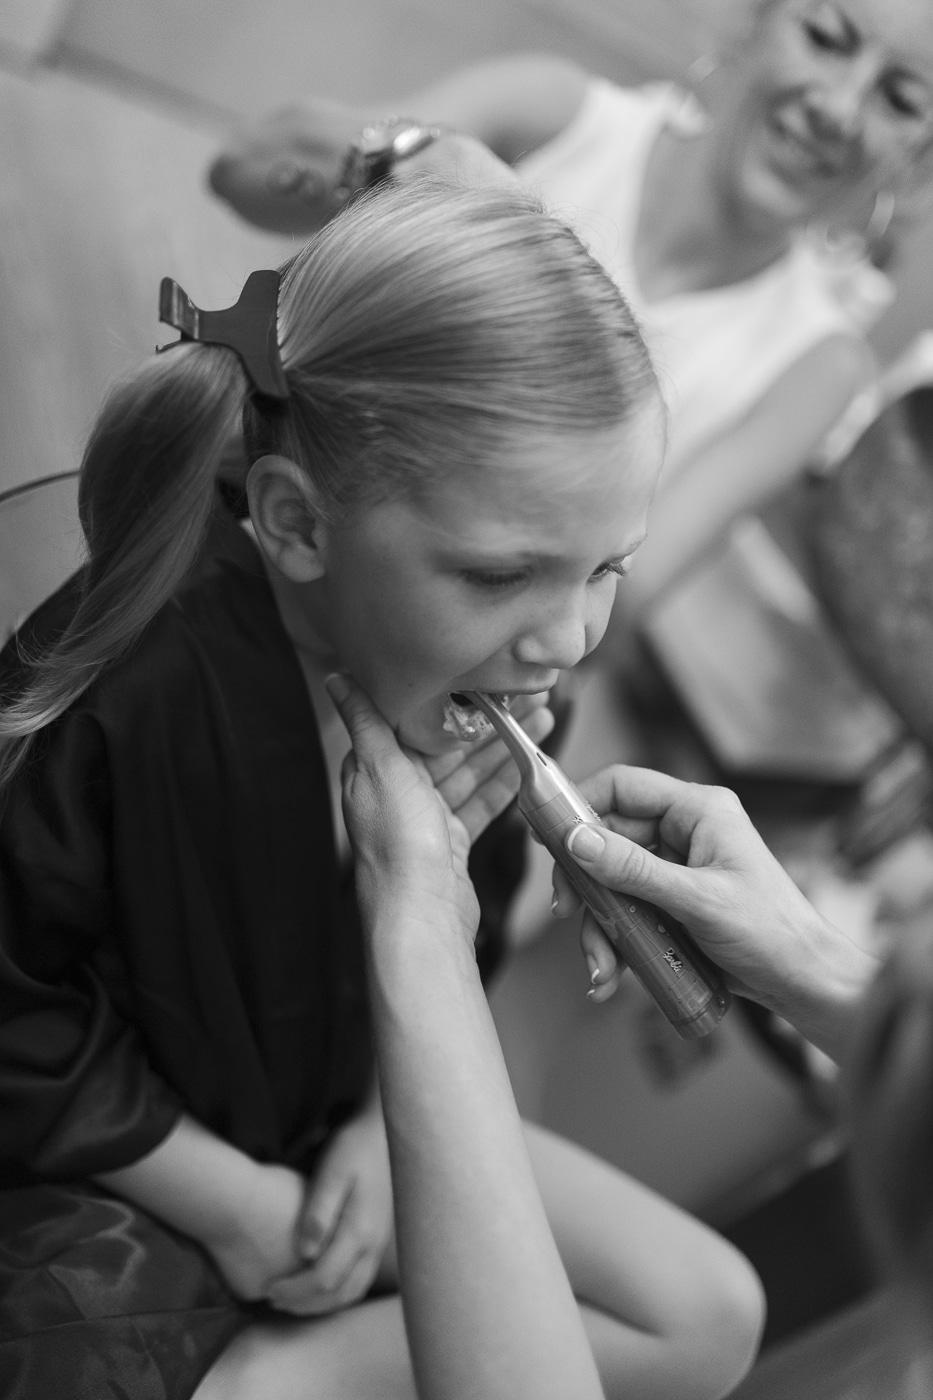 Brushing small girls teeth and doing hair